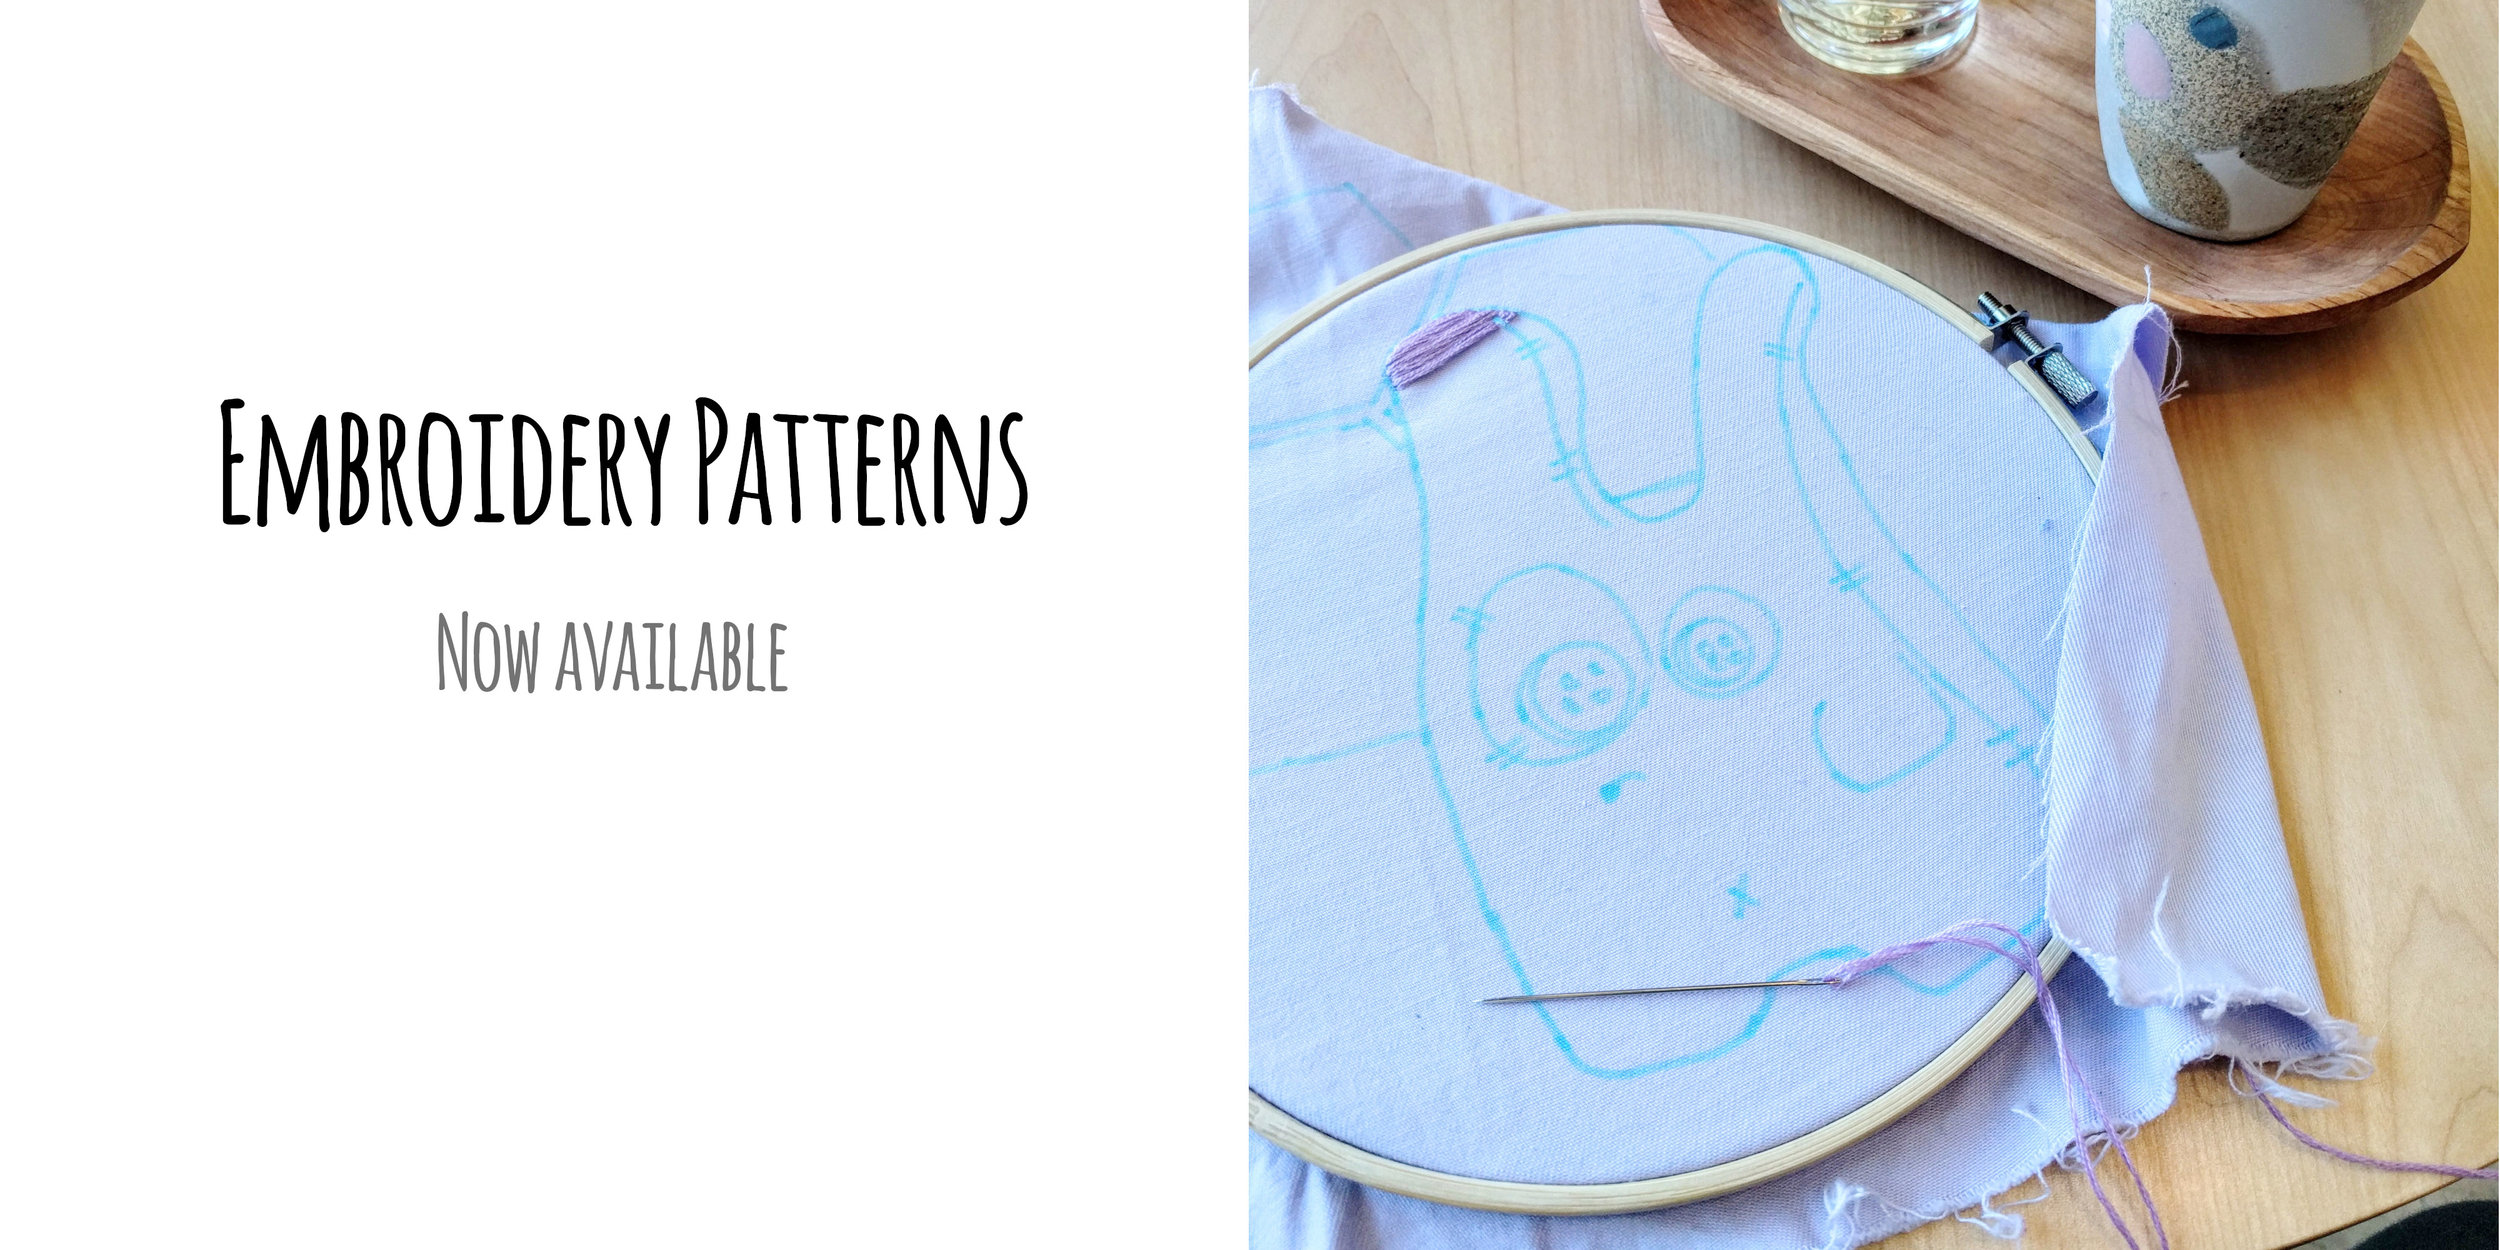 EmbroideryPatterns.jpg